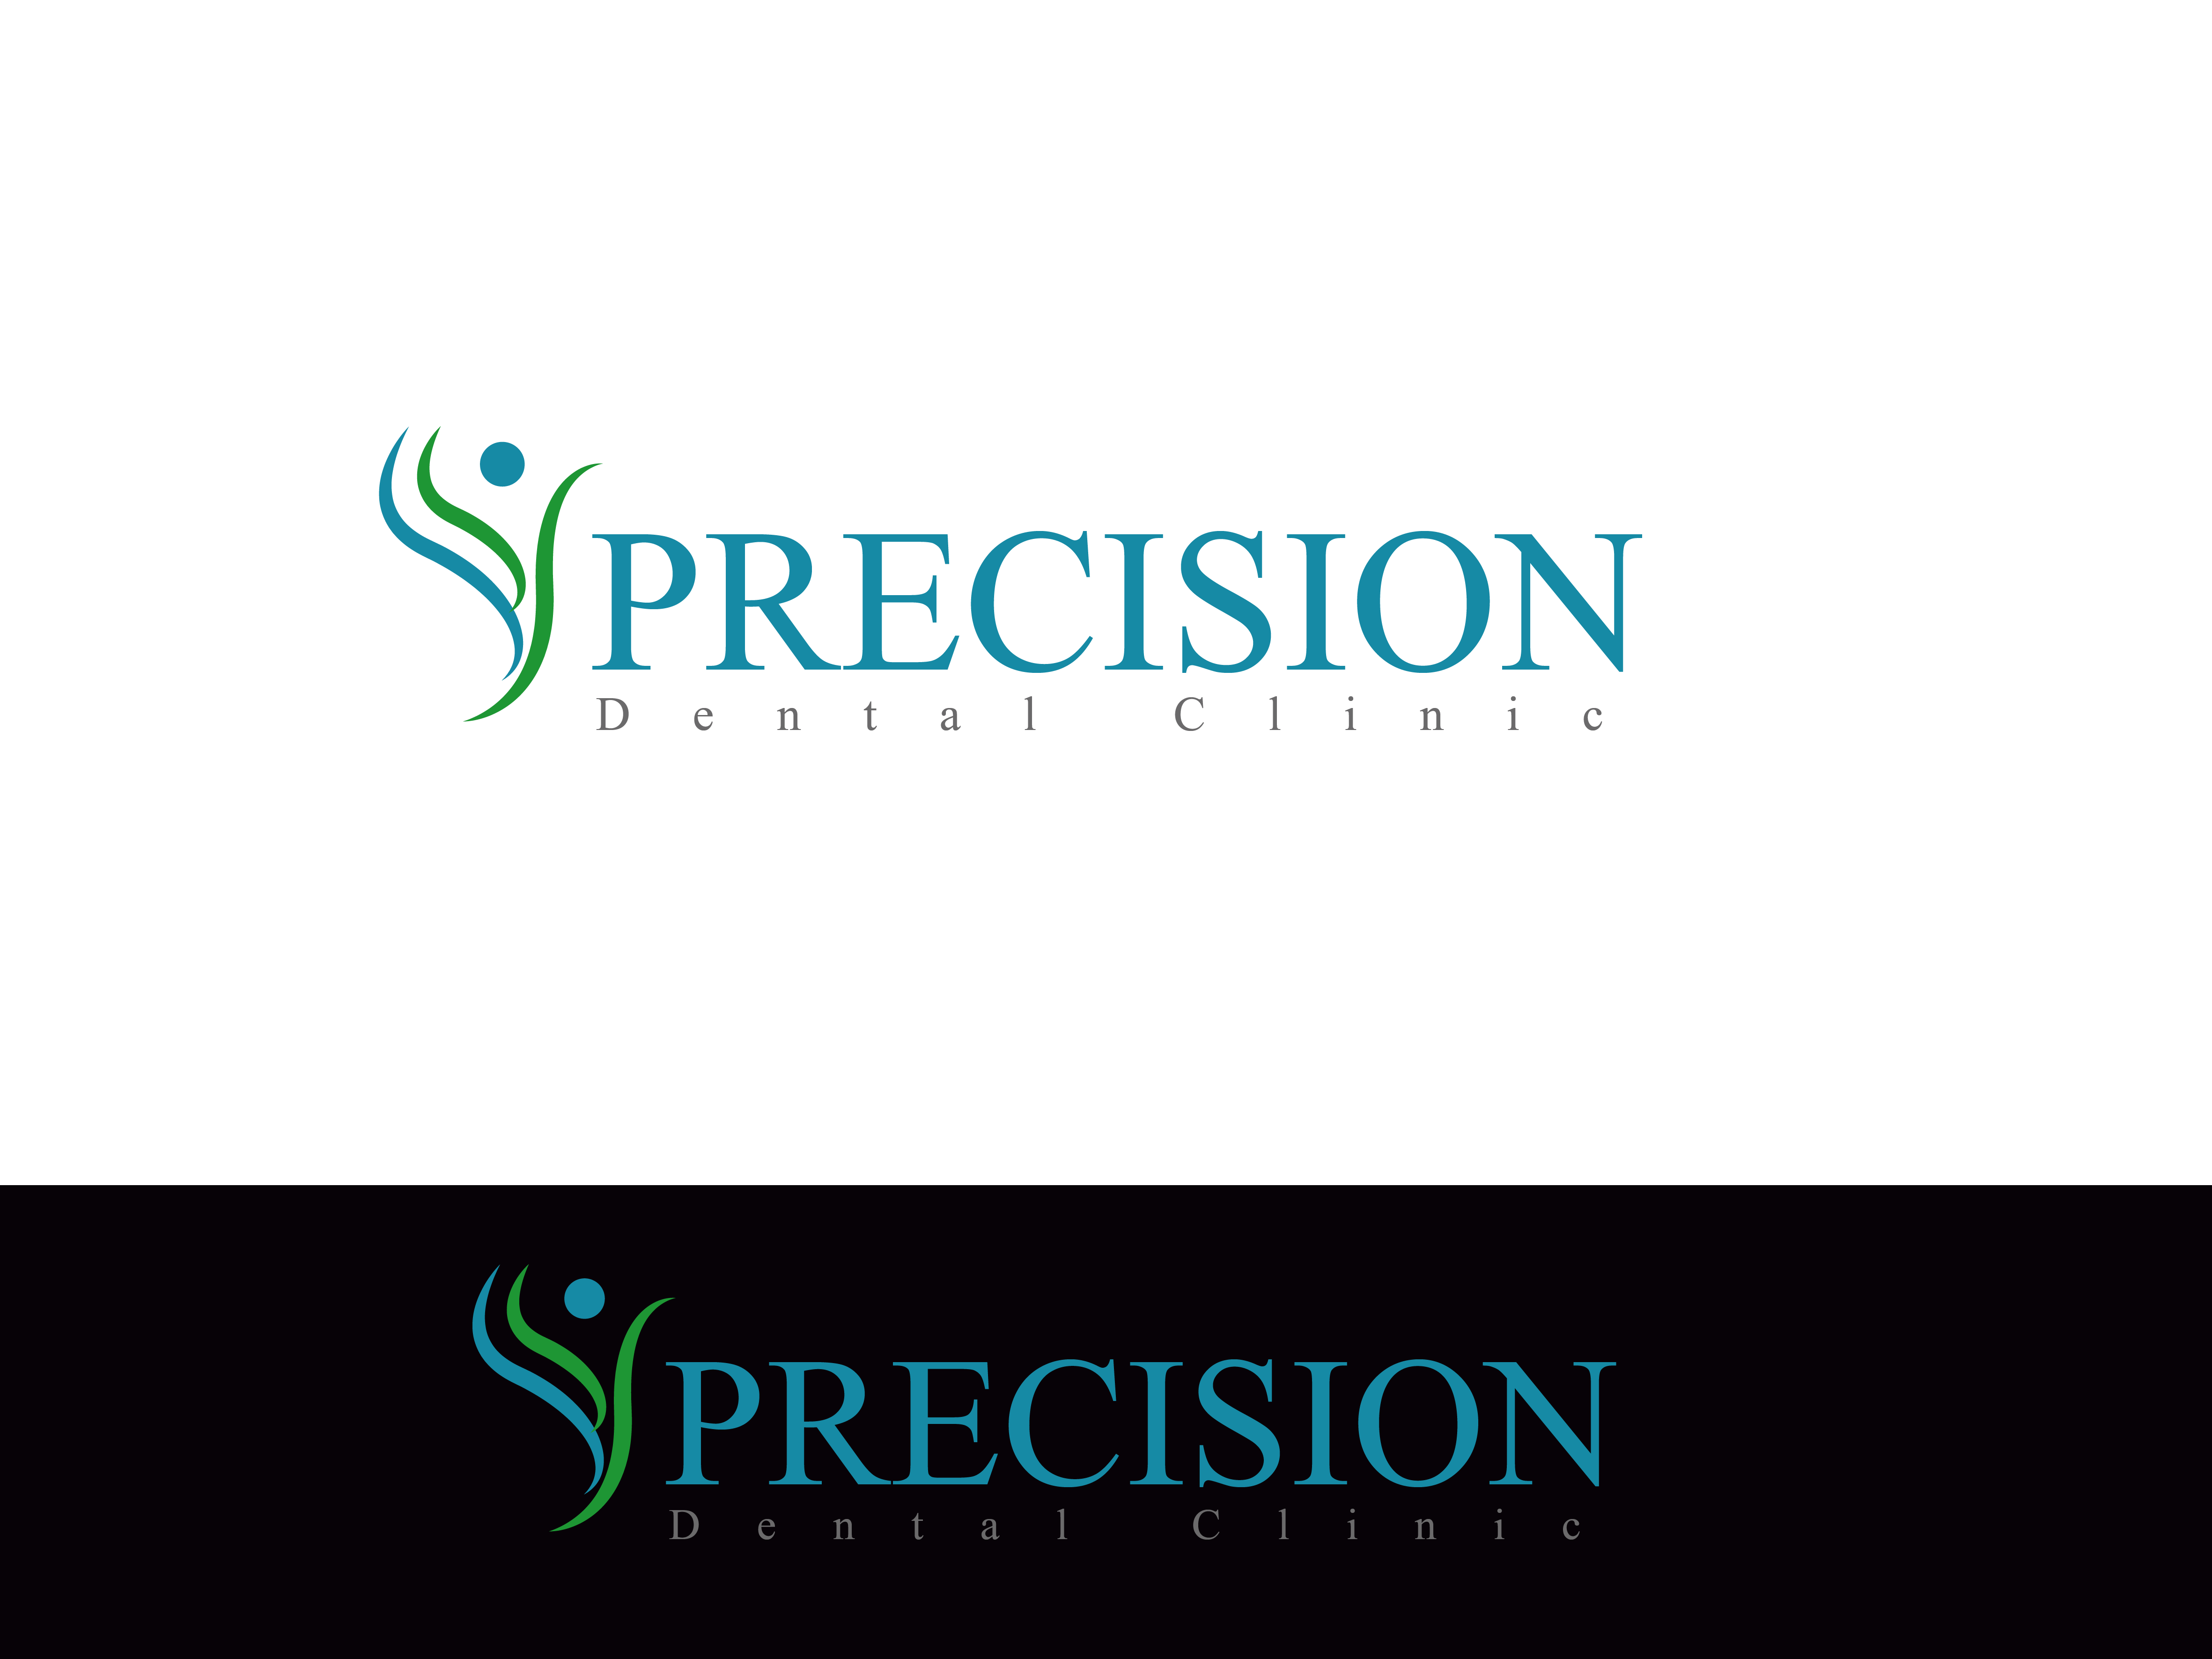 Logo Design by Private User - Entry No. 96 in the Logo Design Contest Captivating Logo Design for Precision Dental Clinic.